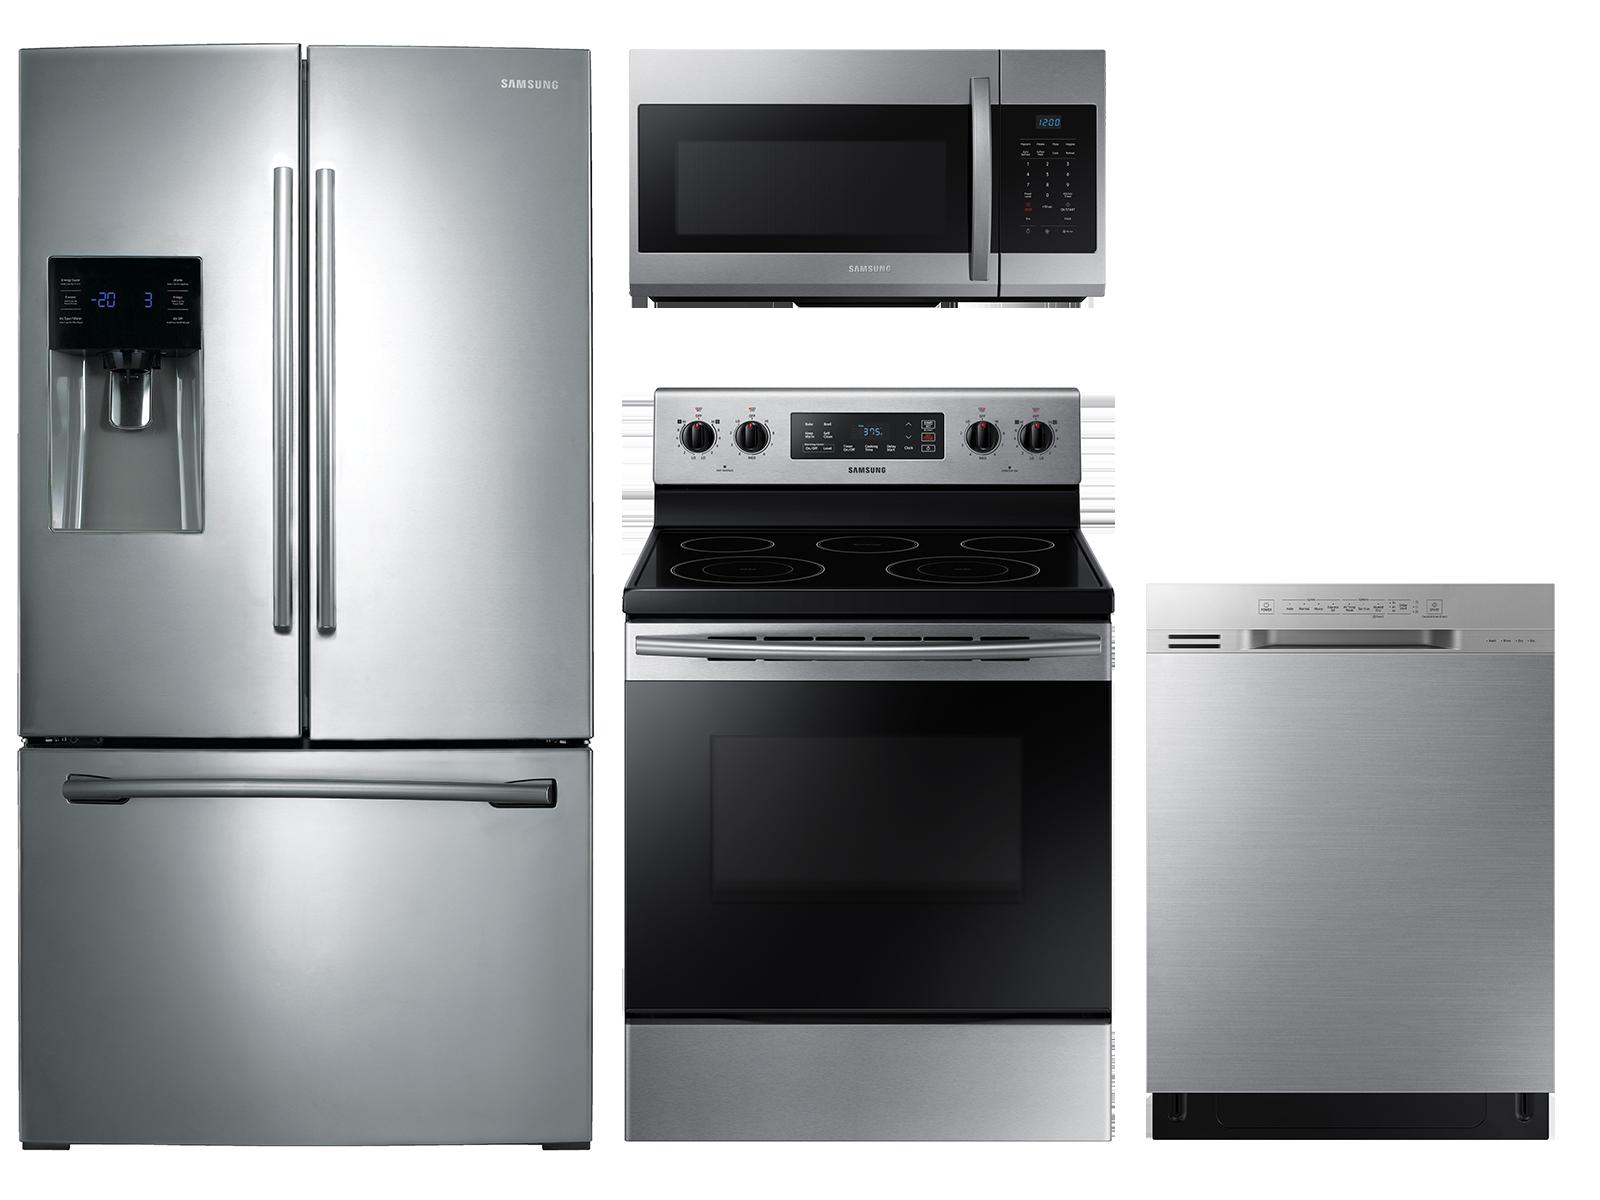 Samsung 3-door Refrigerator + Freestanding Electric Range + Dishwasher + Microwave Kitchen Package in Stainless Steel